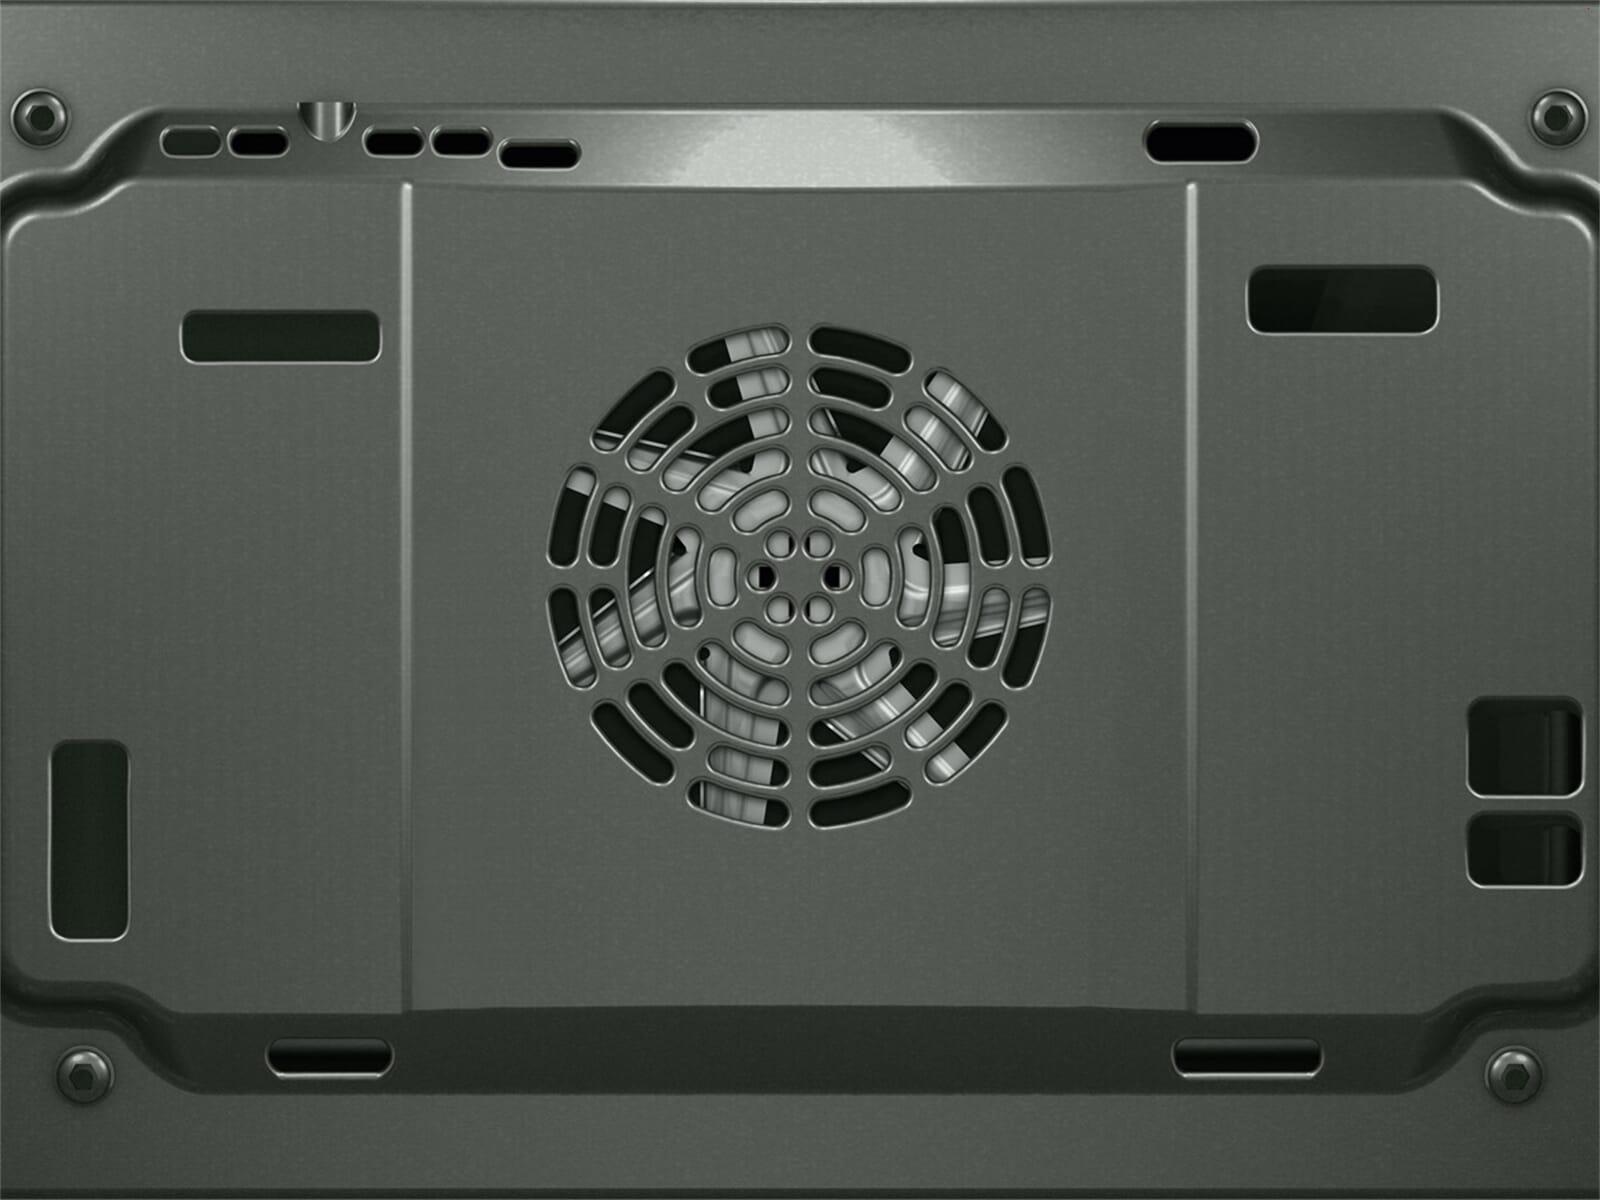 bosch set einbauherd wei hea23b120 glaskeramik kochfeld nkn645g17. Black Bedroom Furniture Sets. Home Design Ideas